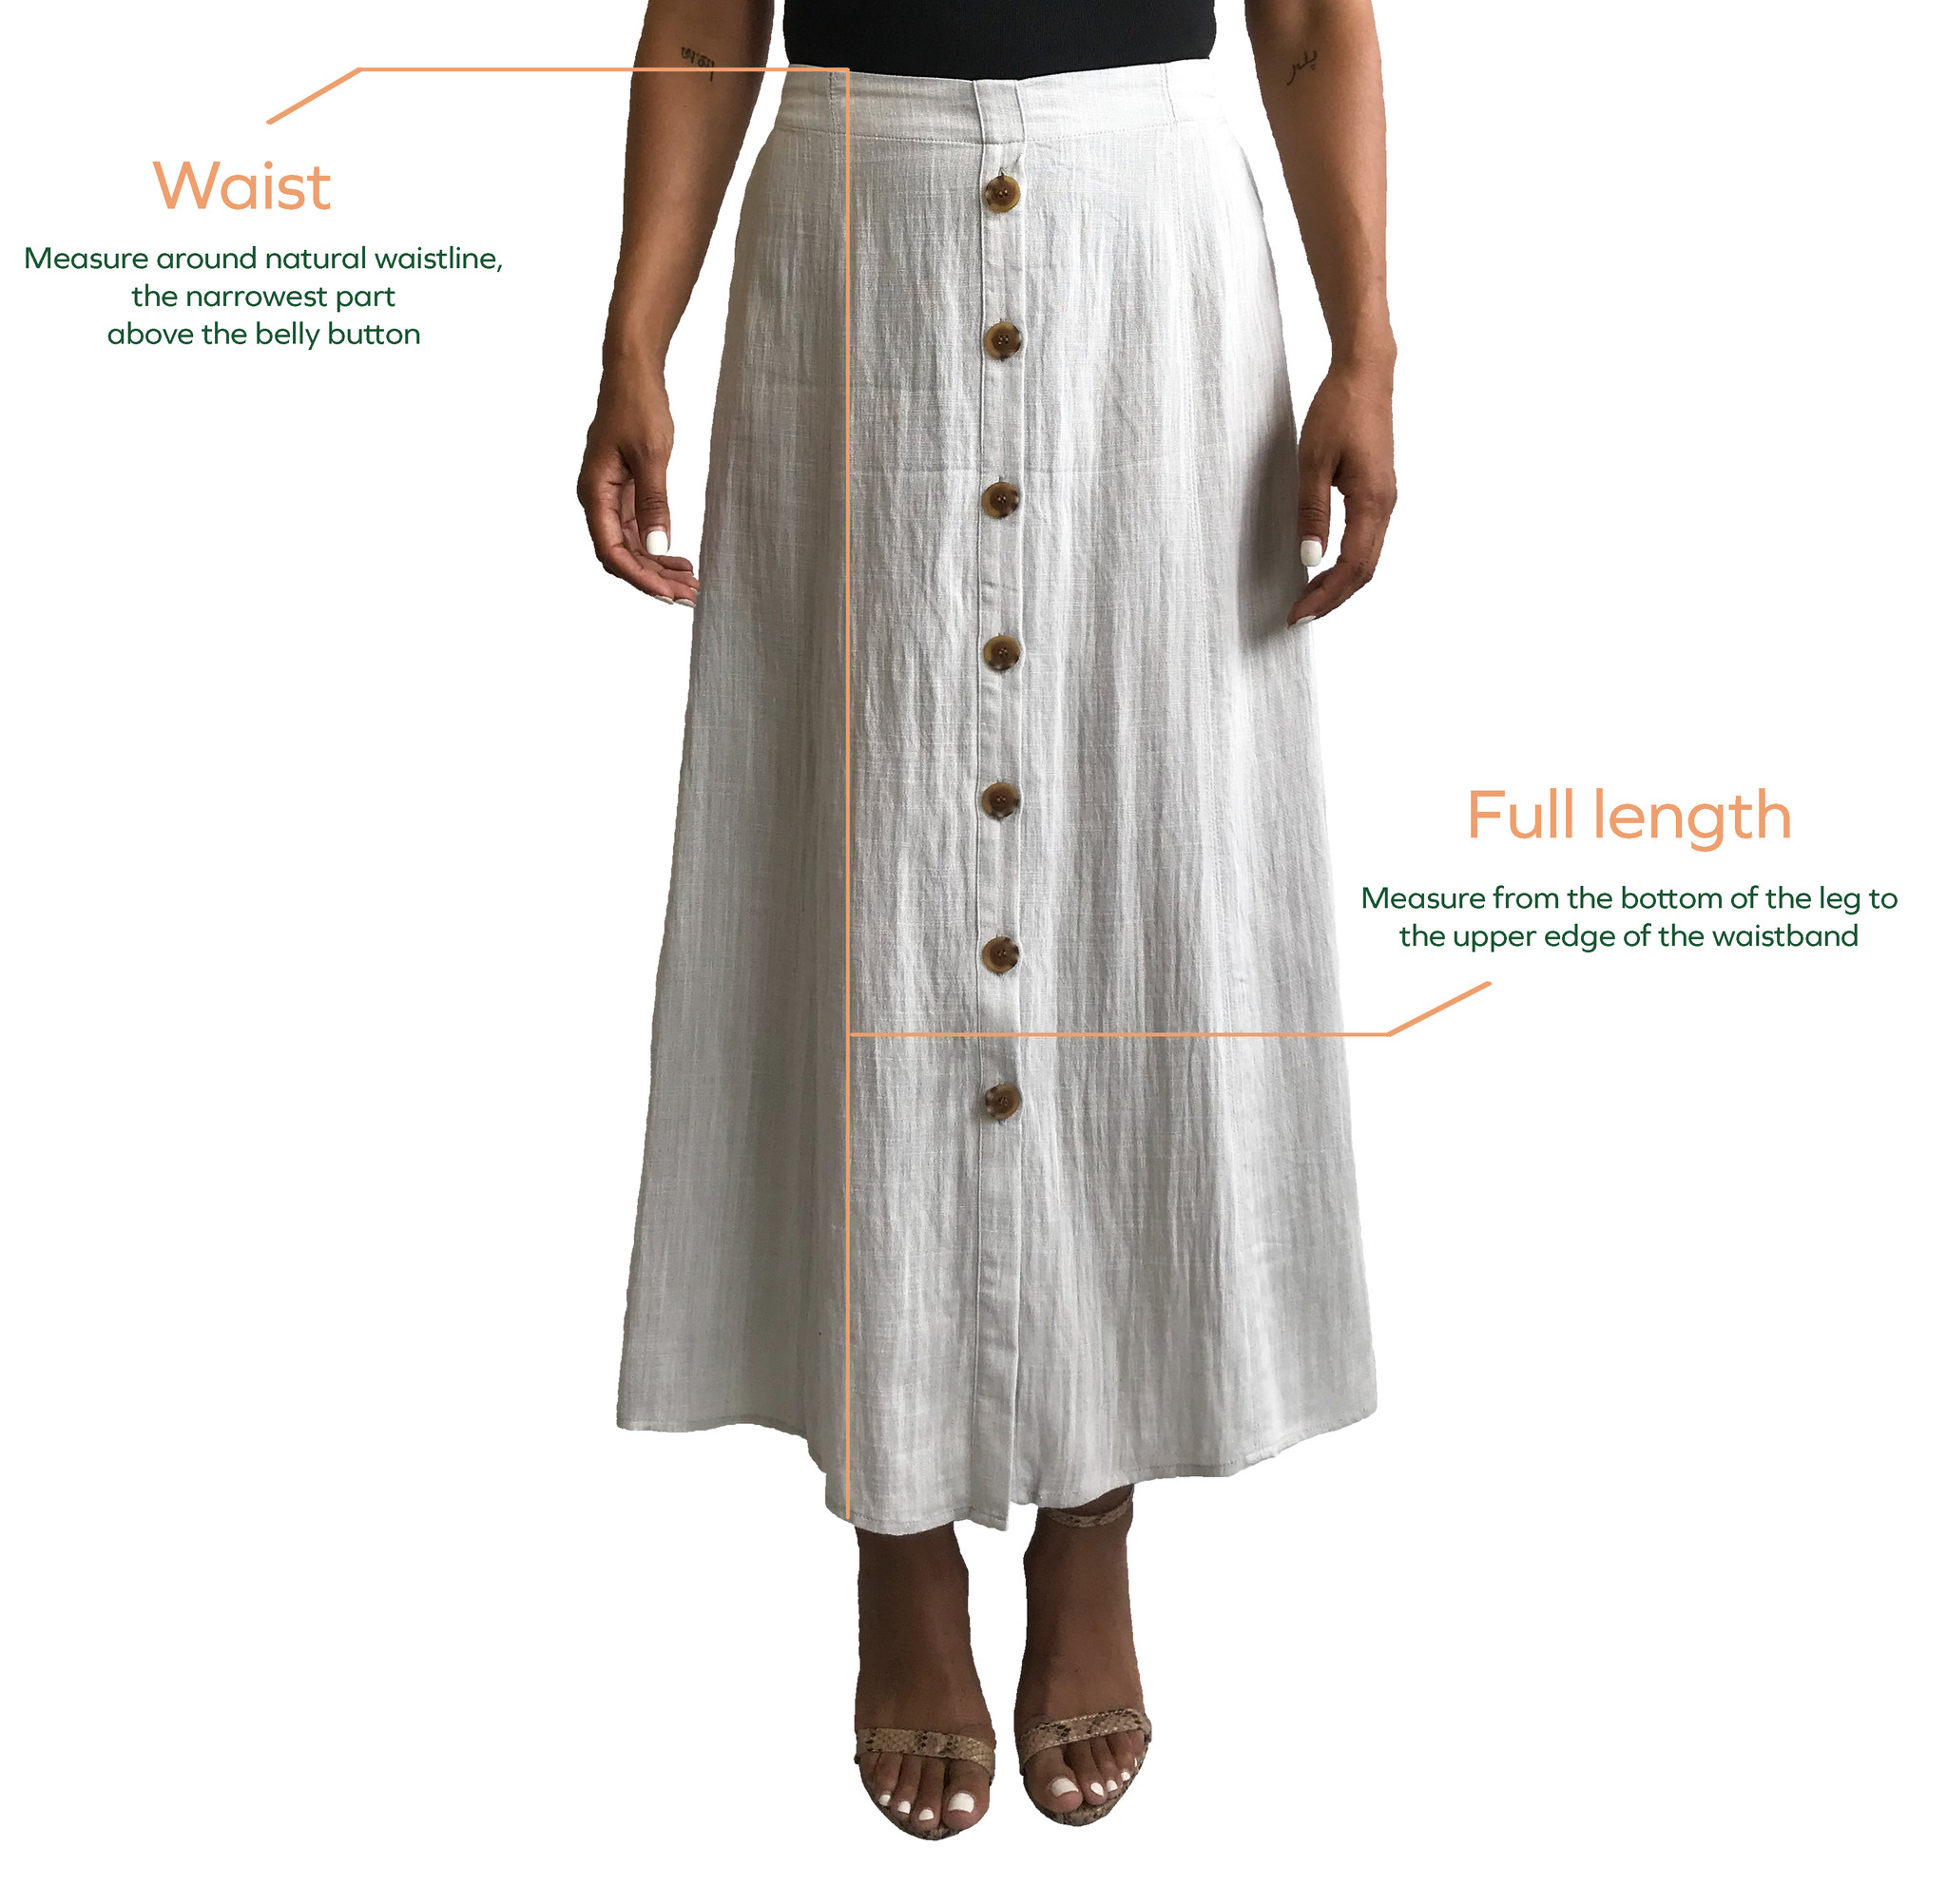 Skirt/Dress Measurements